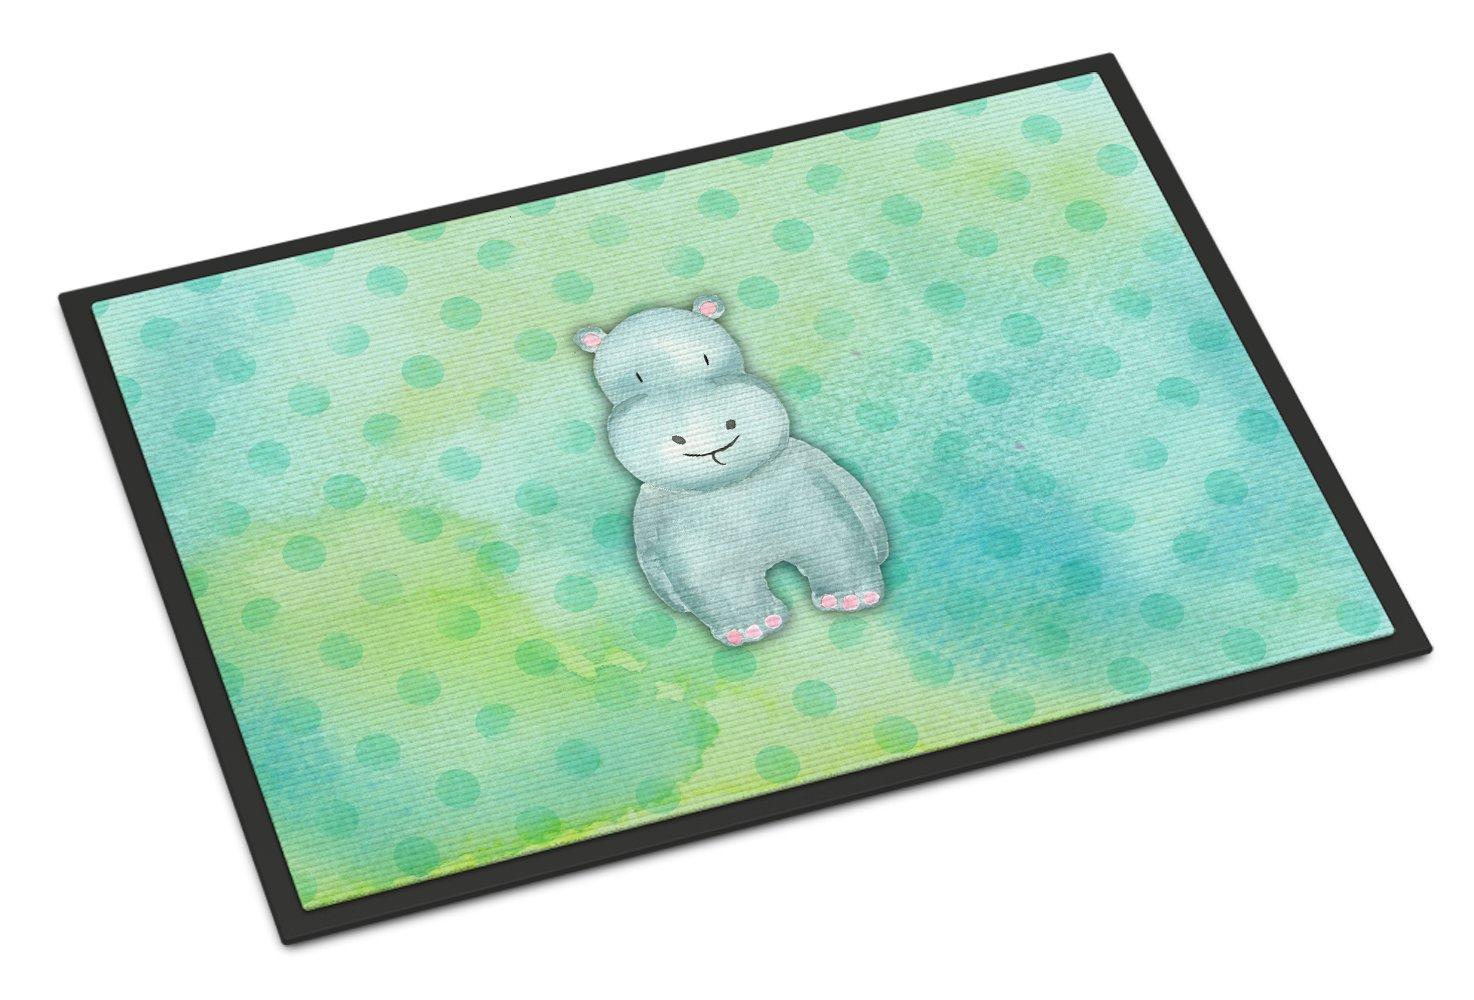 Carolines Treasures Polkadot Hippopotamus Watercolor Doormat 24 H x 36 W Multicolor